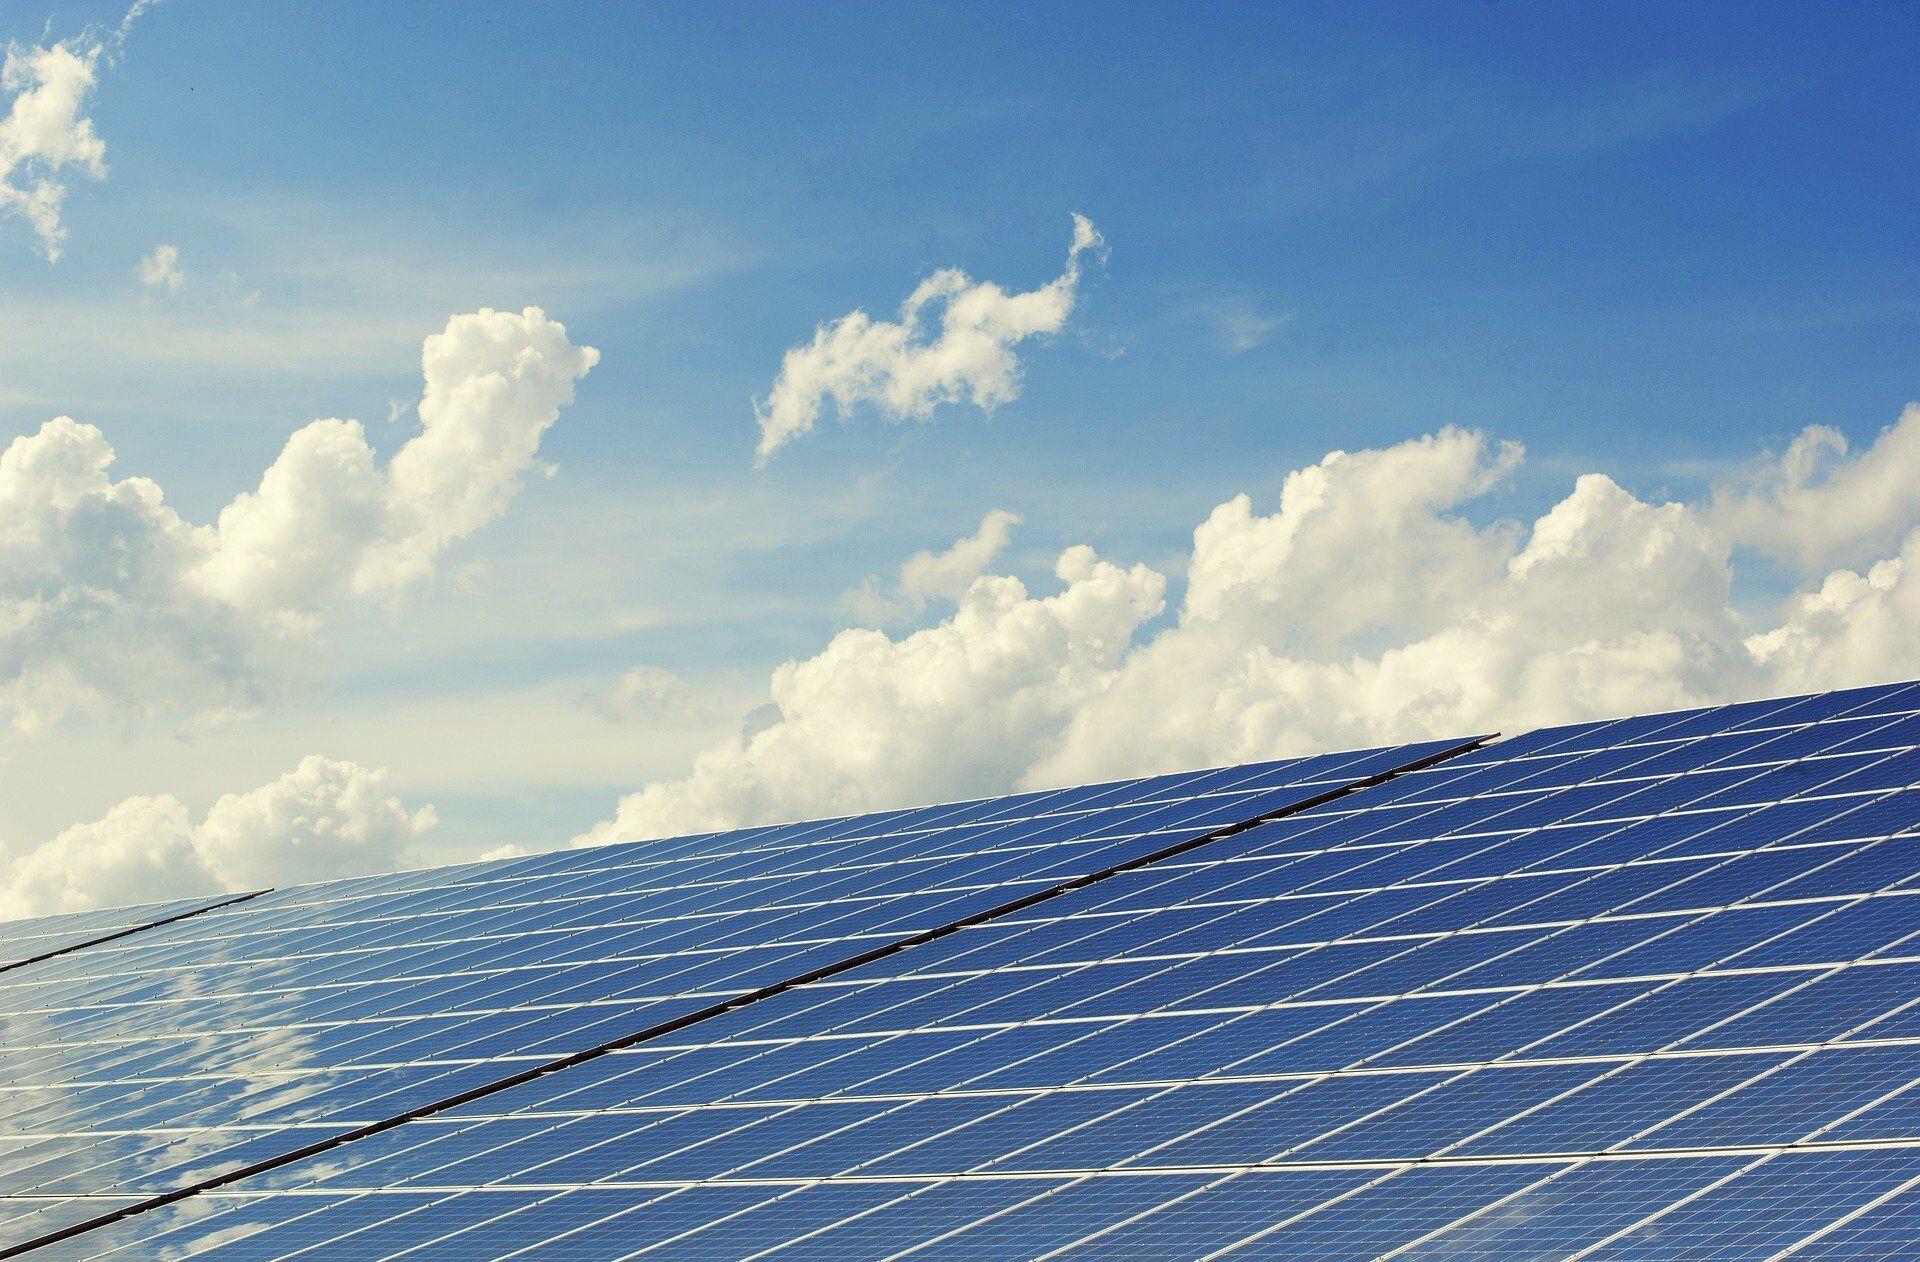 amazon, energía renovable, inmobiliare-alt